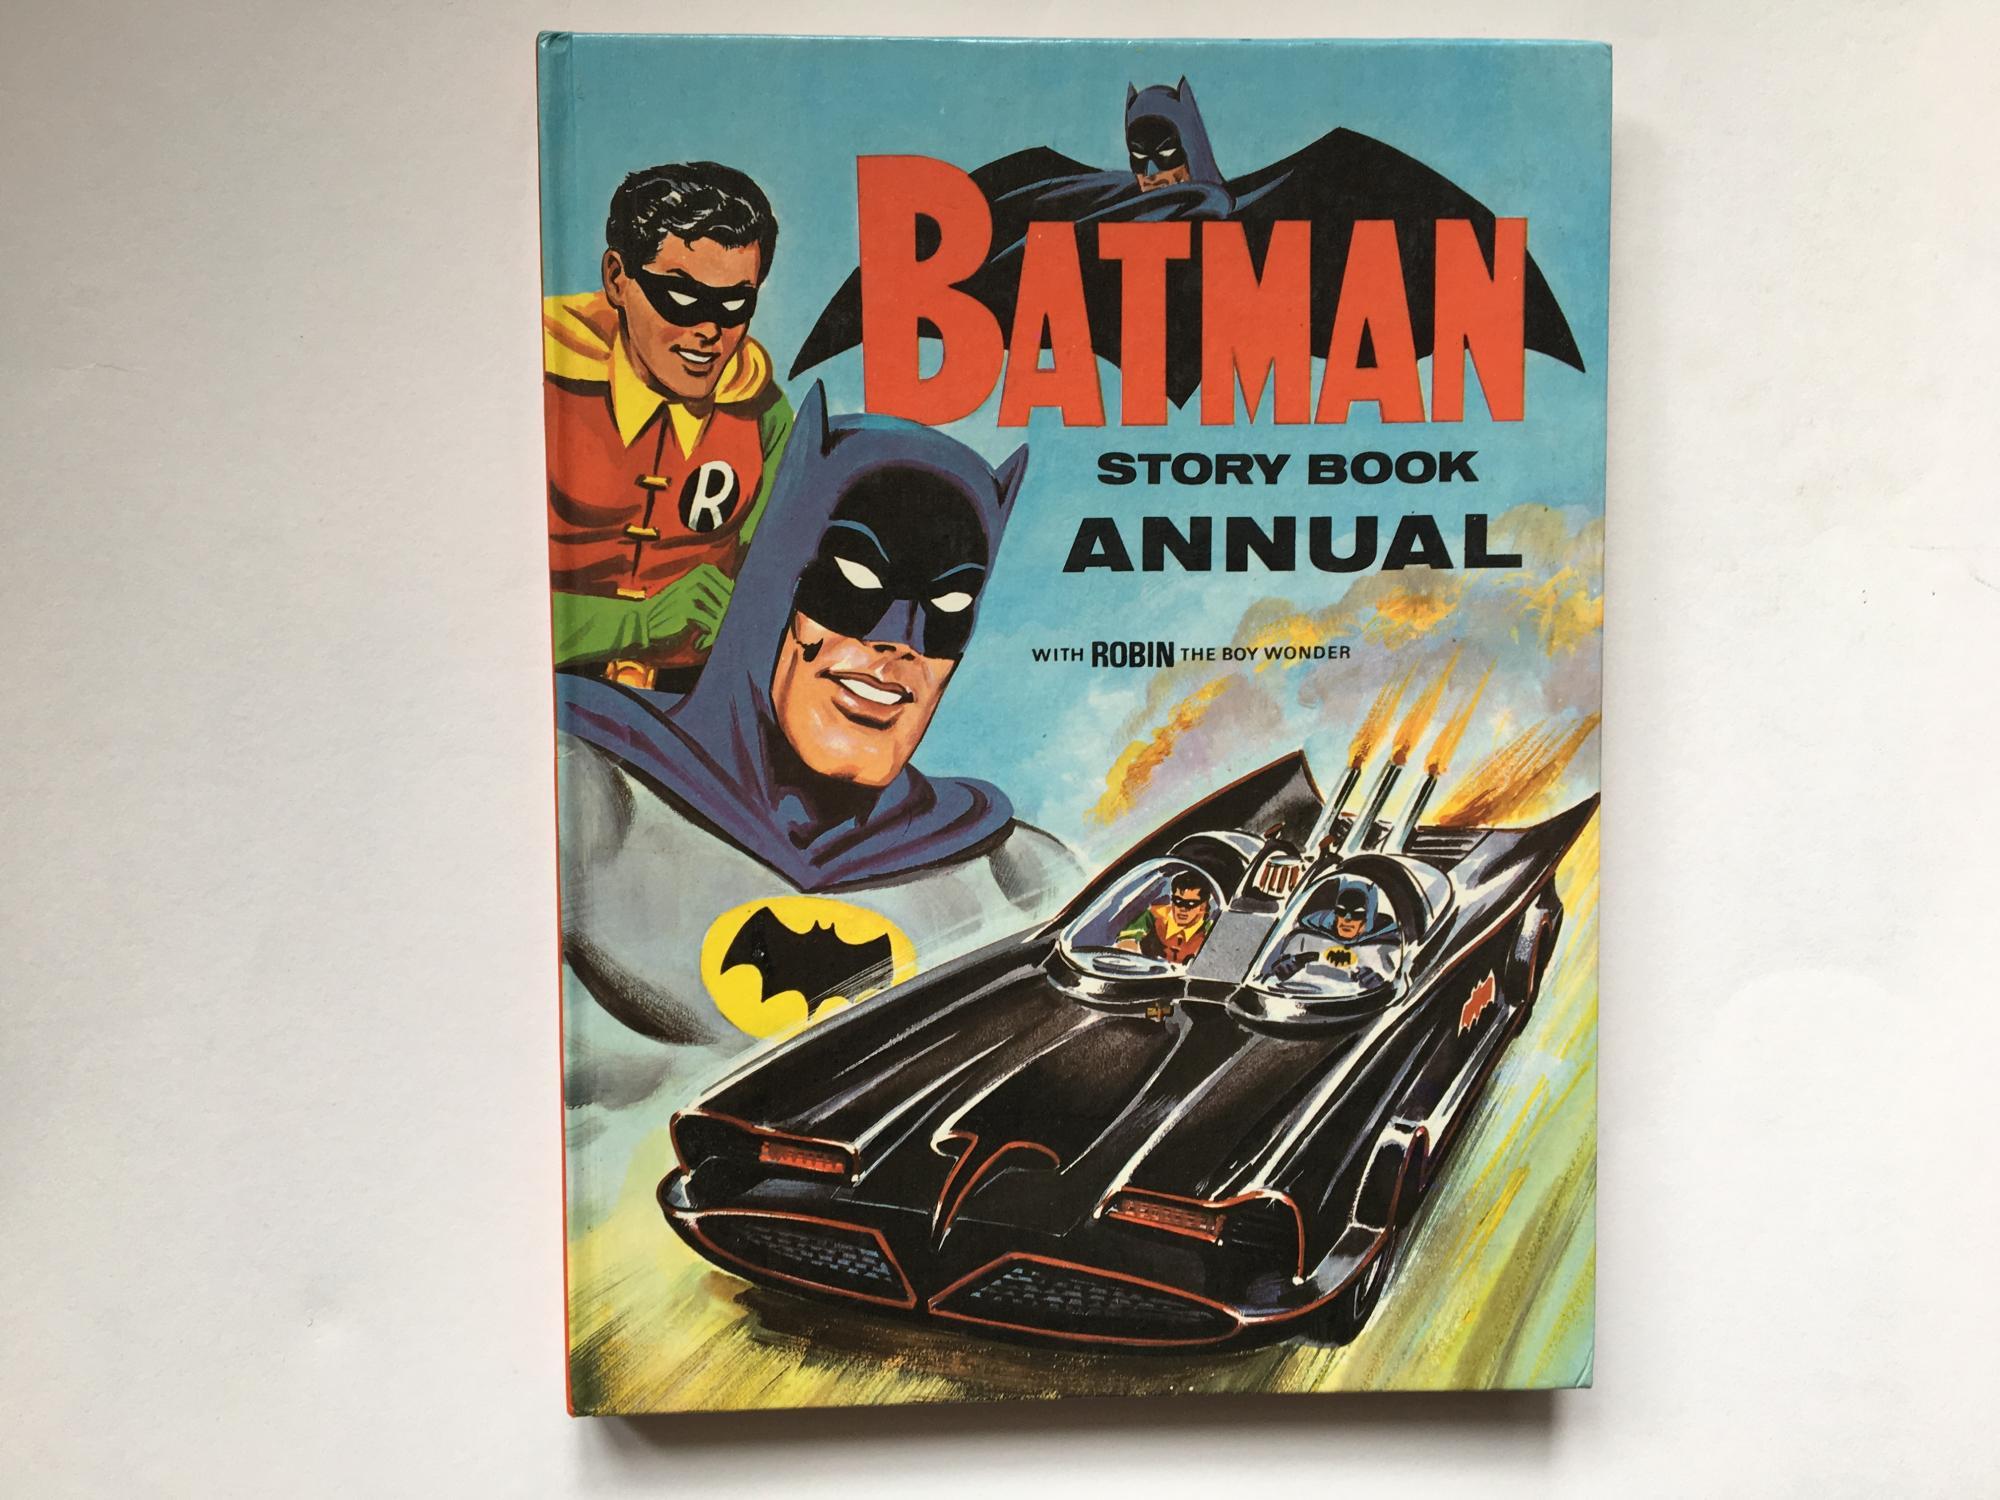 Batman story book